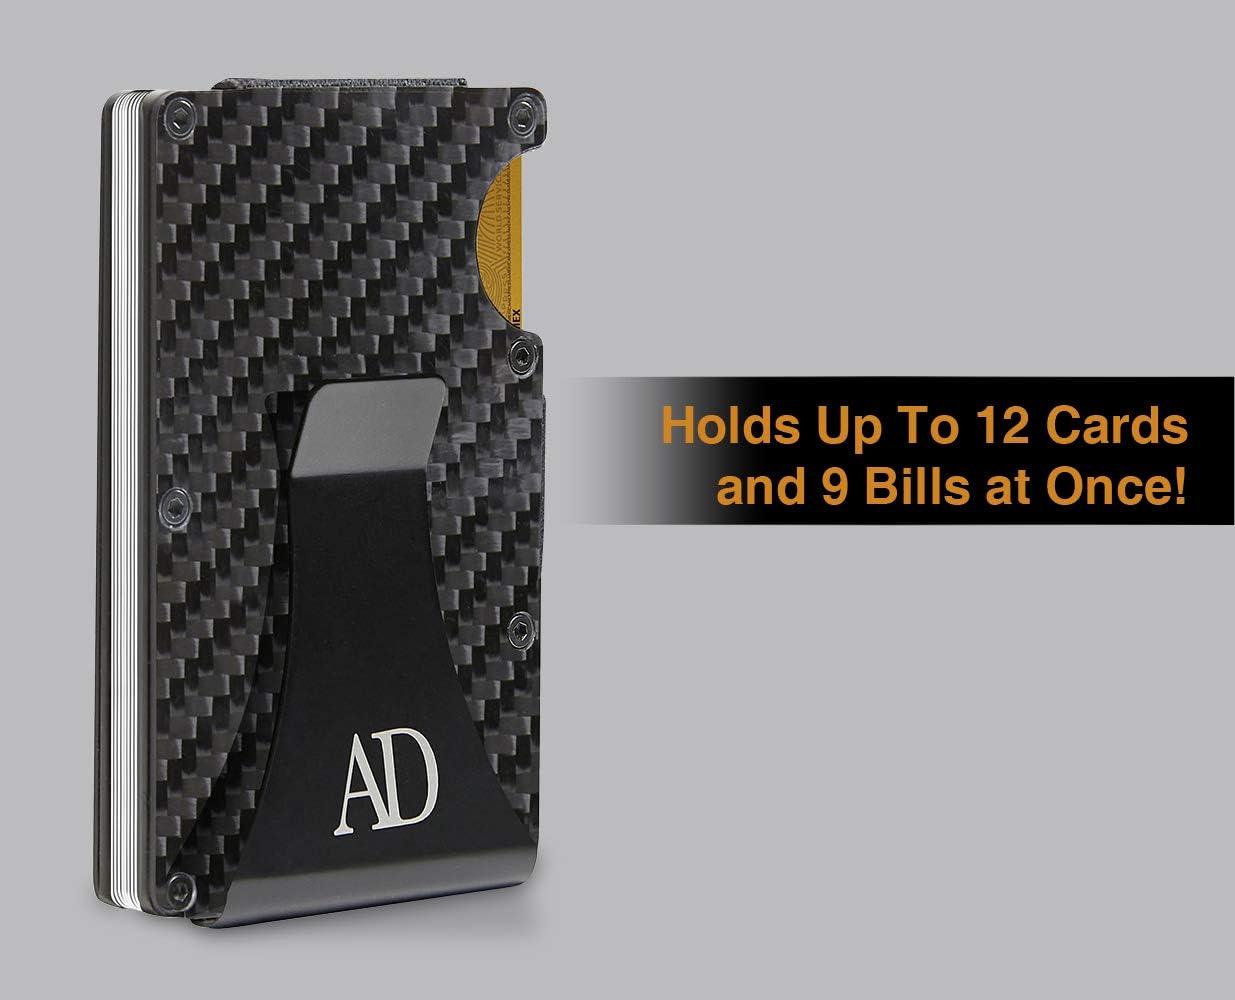 Minimalist Aluminum Wallet for Men Mens Wallet Slim Card Holder Money Clip Wallet Metal RFID Carbon Fiber Wallets for Men